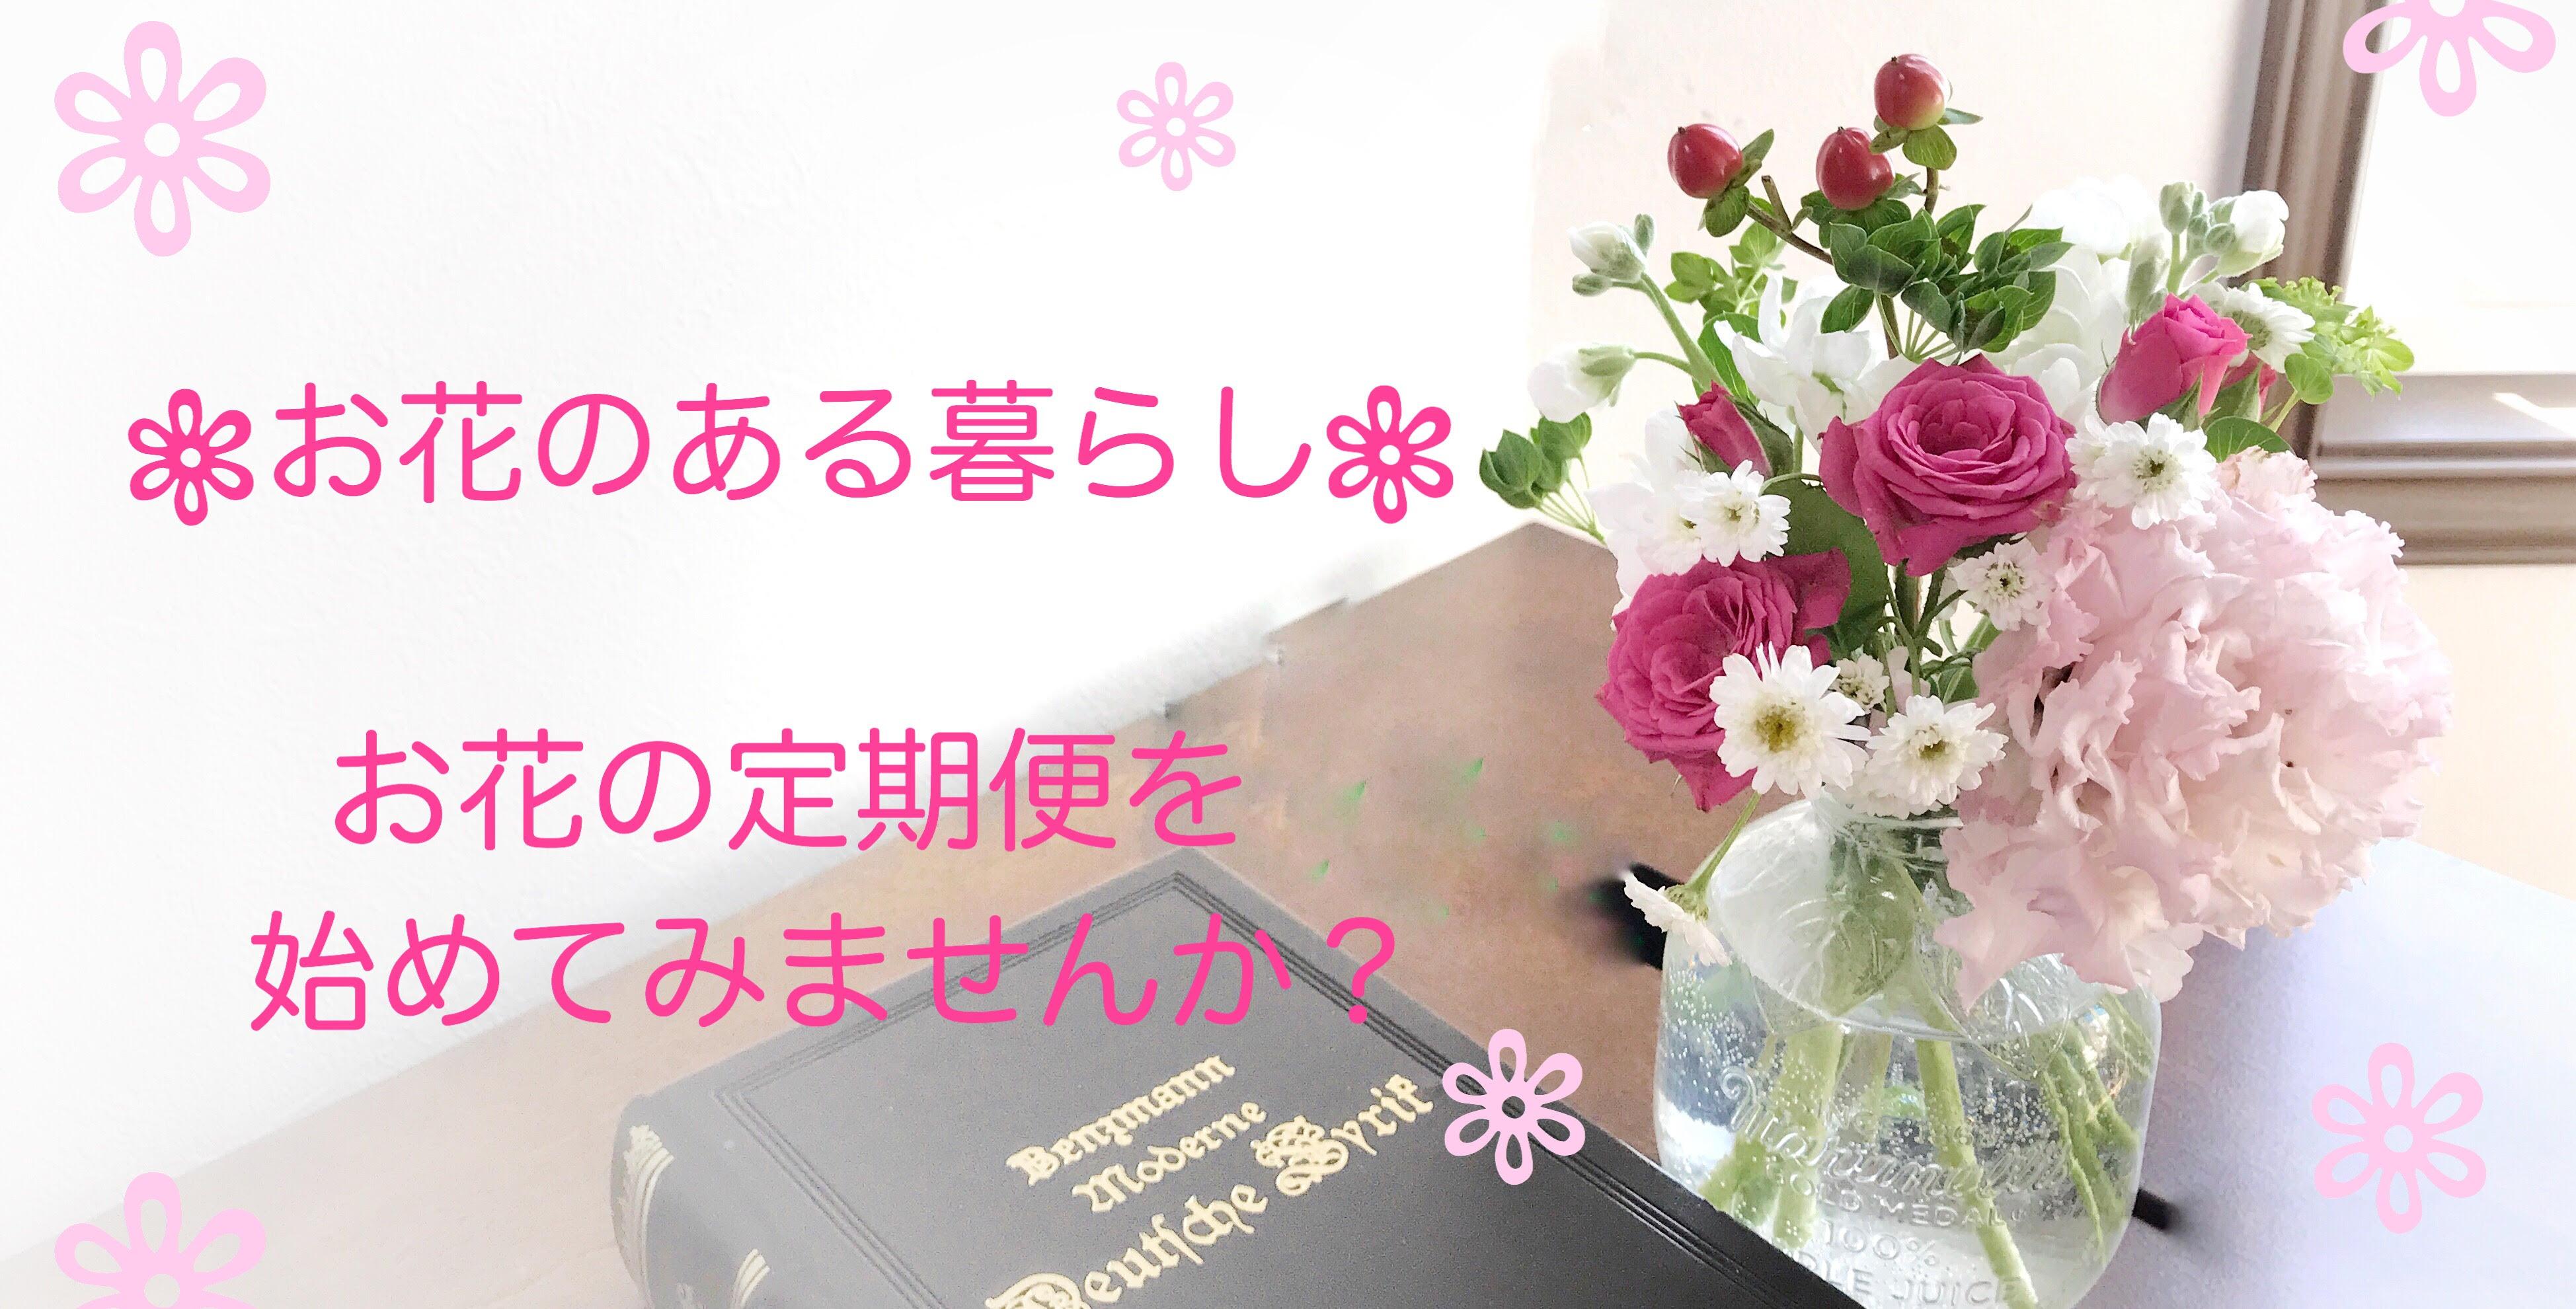 Miraflora ミラフローラ花のオンラインショップ紹介画像2